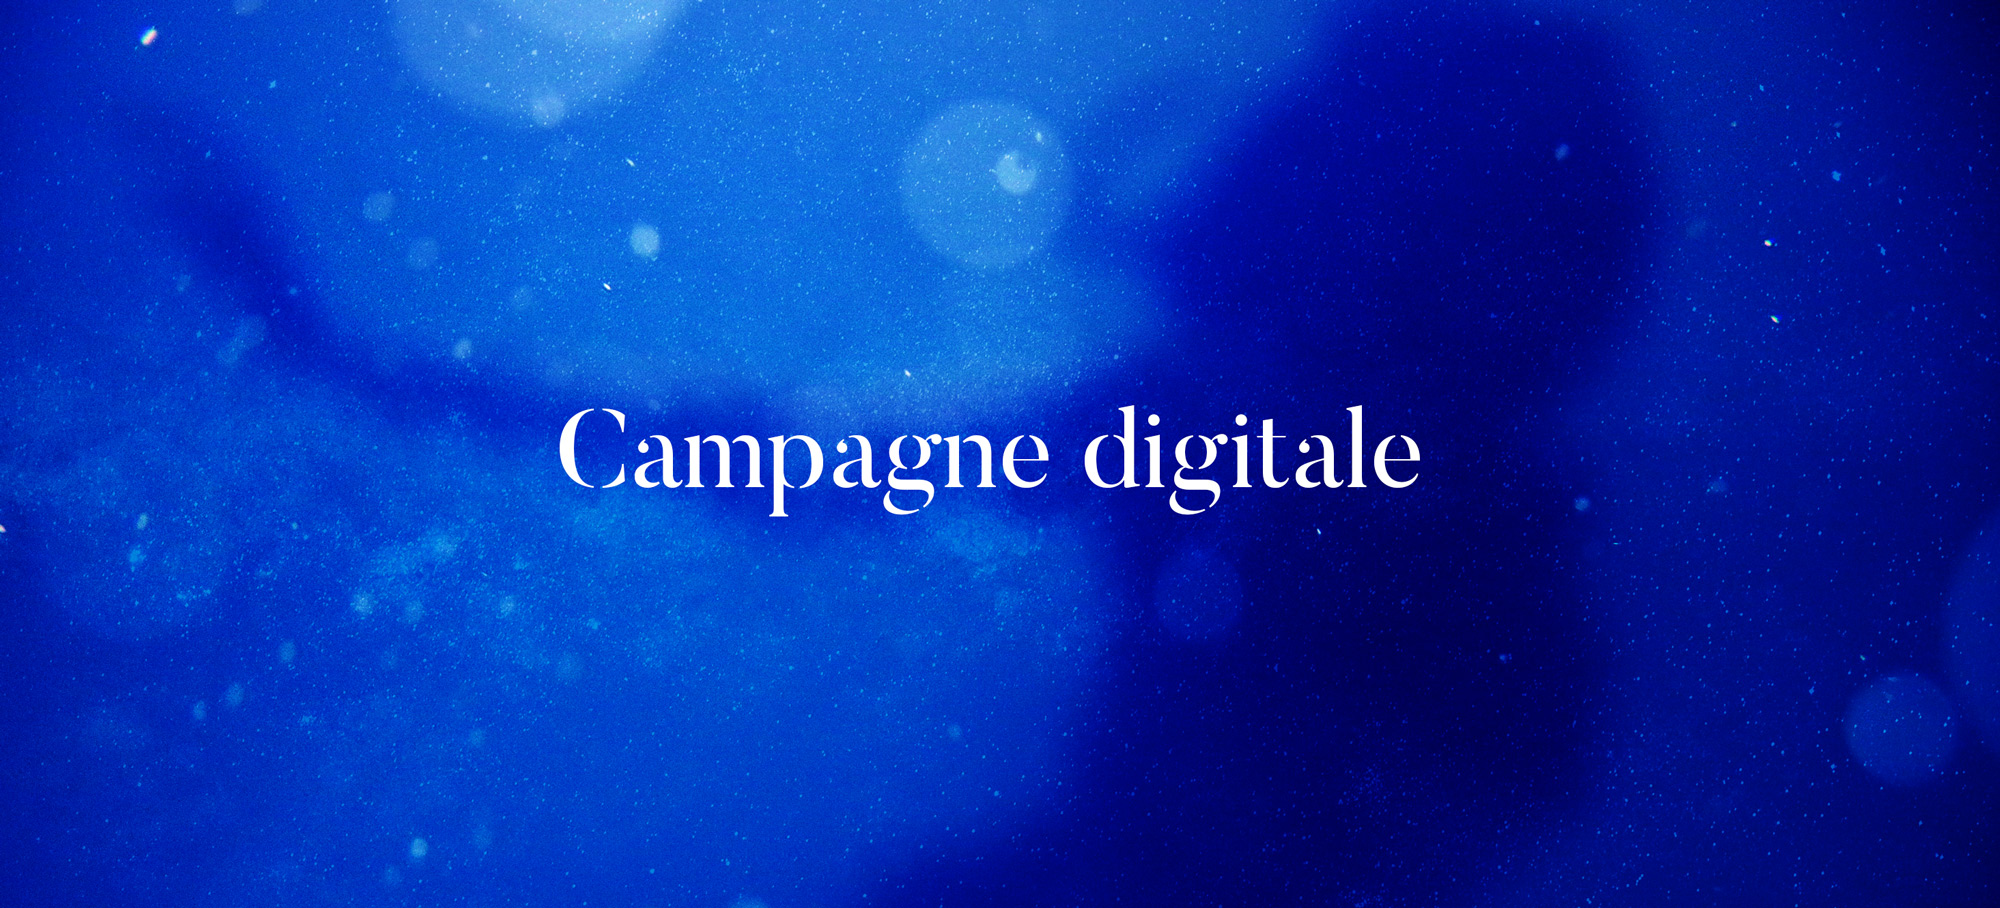 campagne-digitale-agence-ysee-valentine-franssen